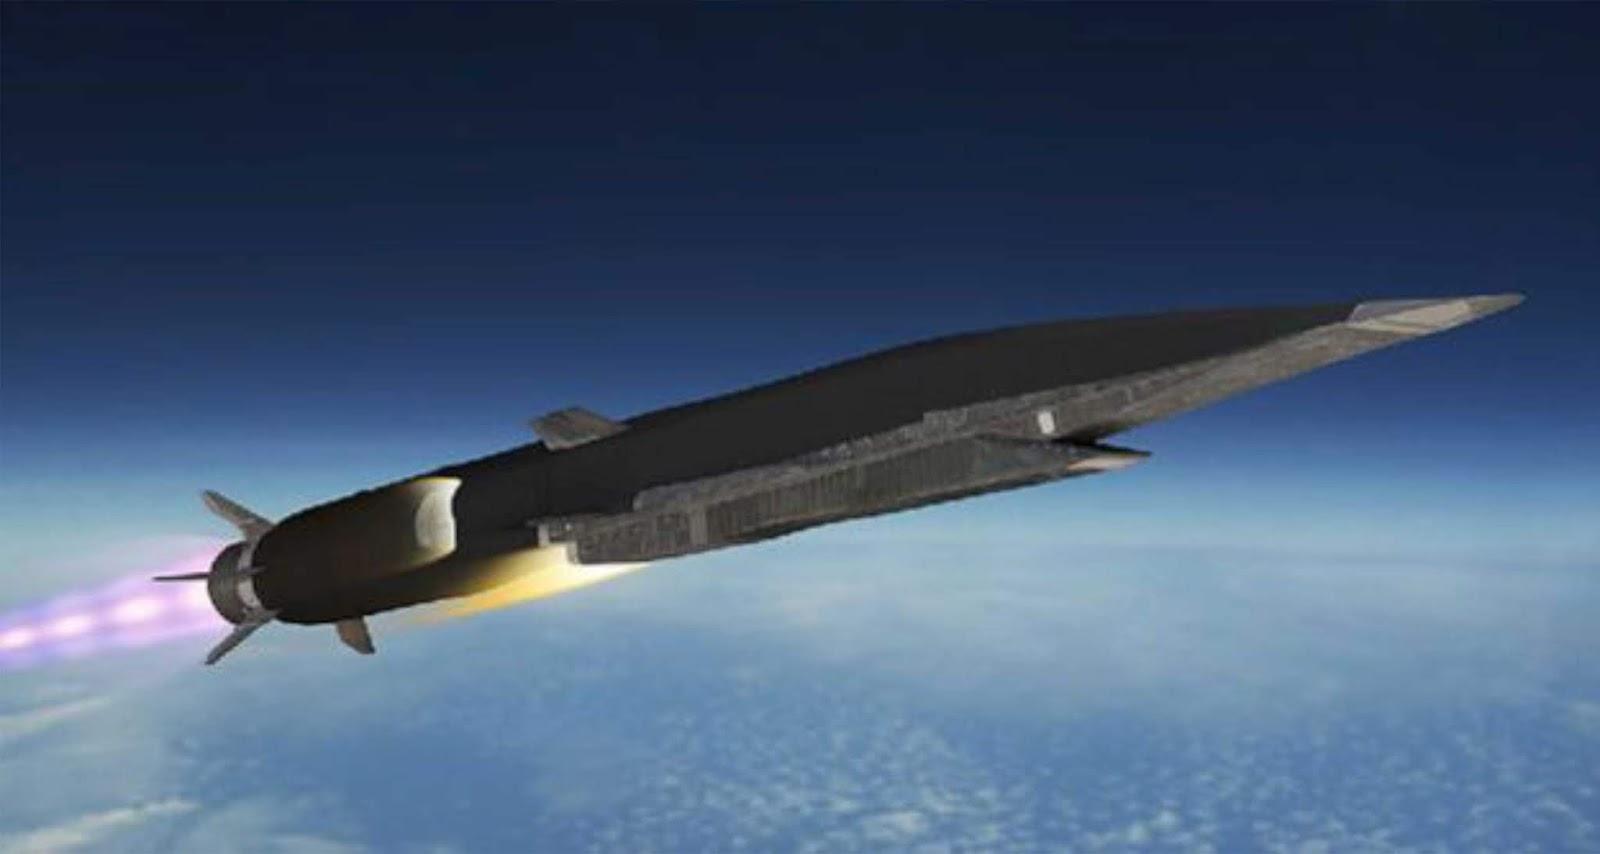 #Fregat Admiral Gorshkov akan menjadi pengguna rudal Zircon pertama